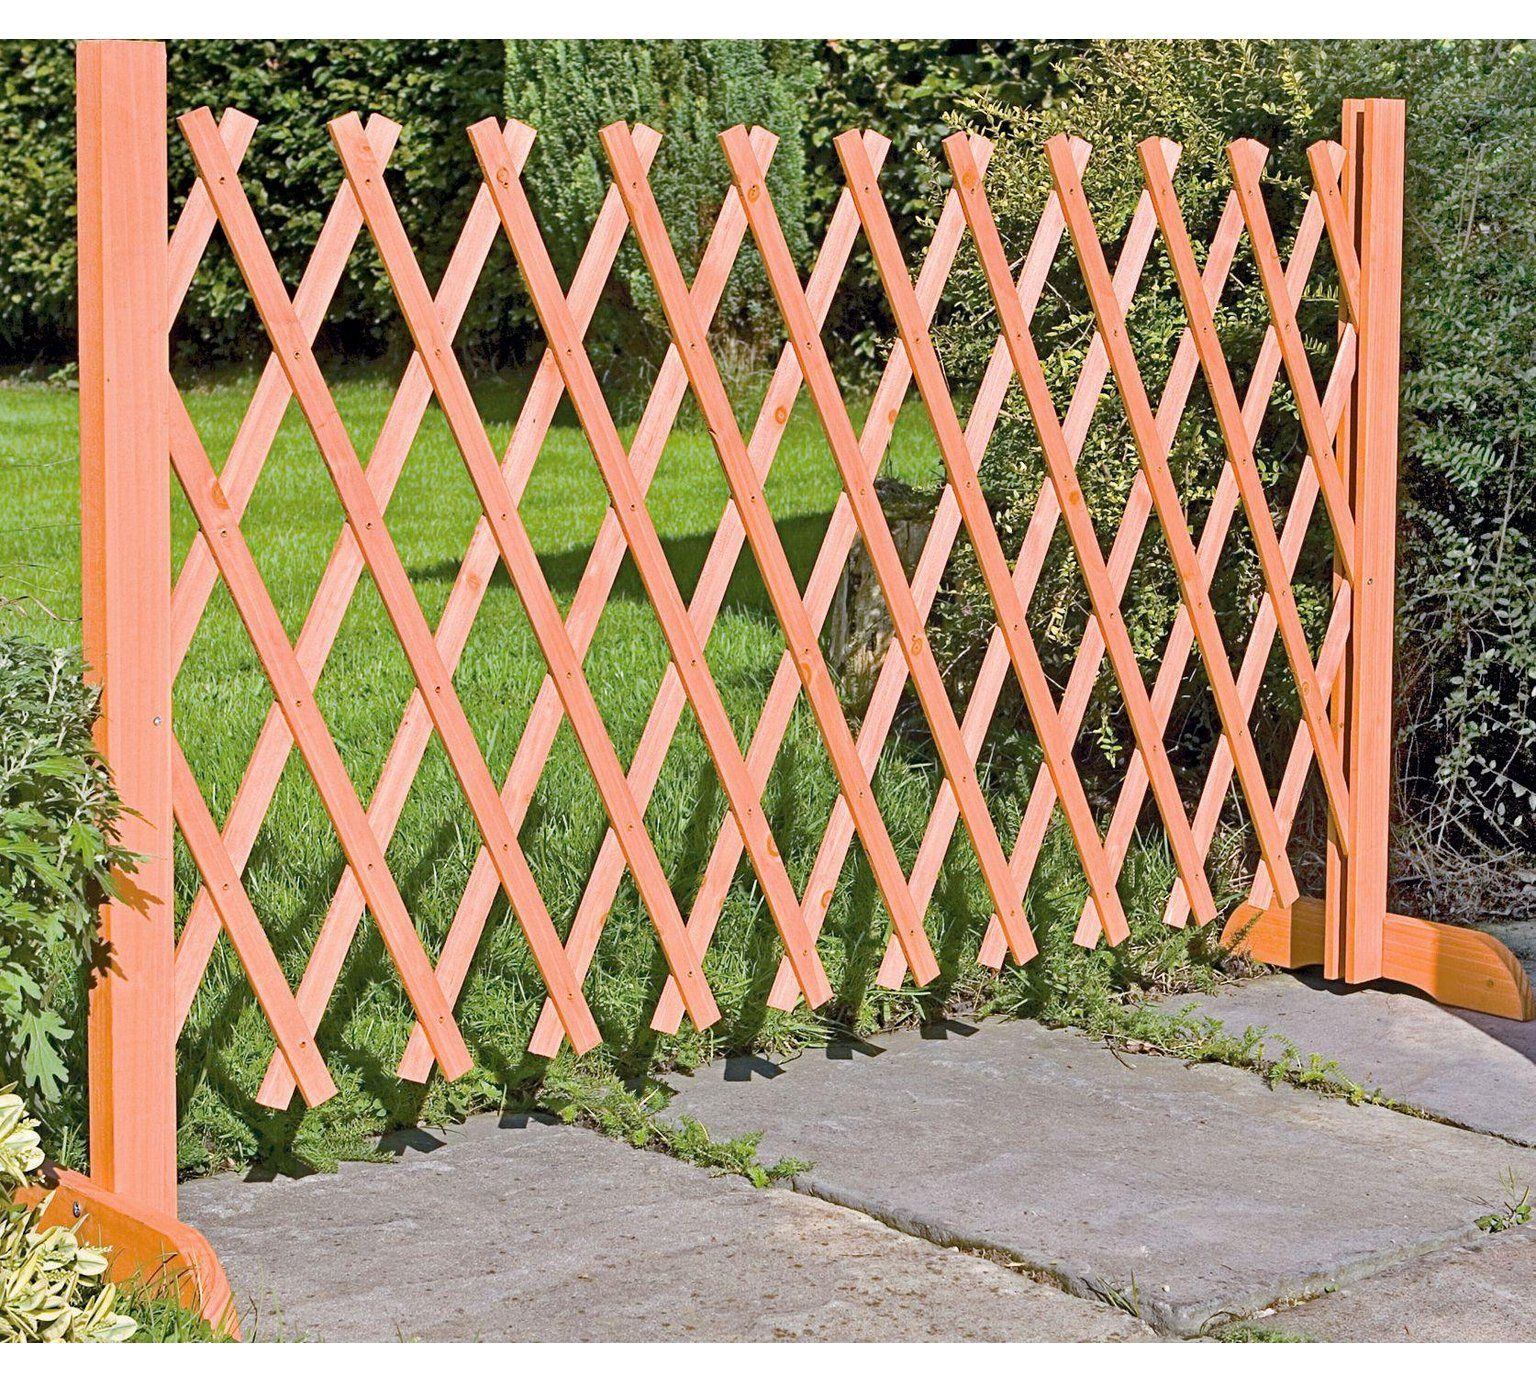 Buy Wooden Expanding Fencing Garden Fencing And Trellis Argos Outdoor Trellis Trellis Fence Garden Fencing